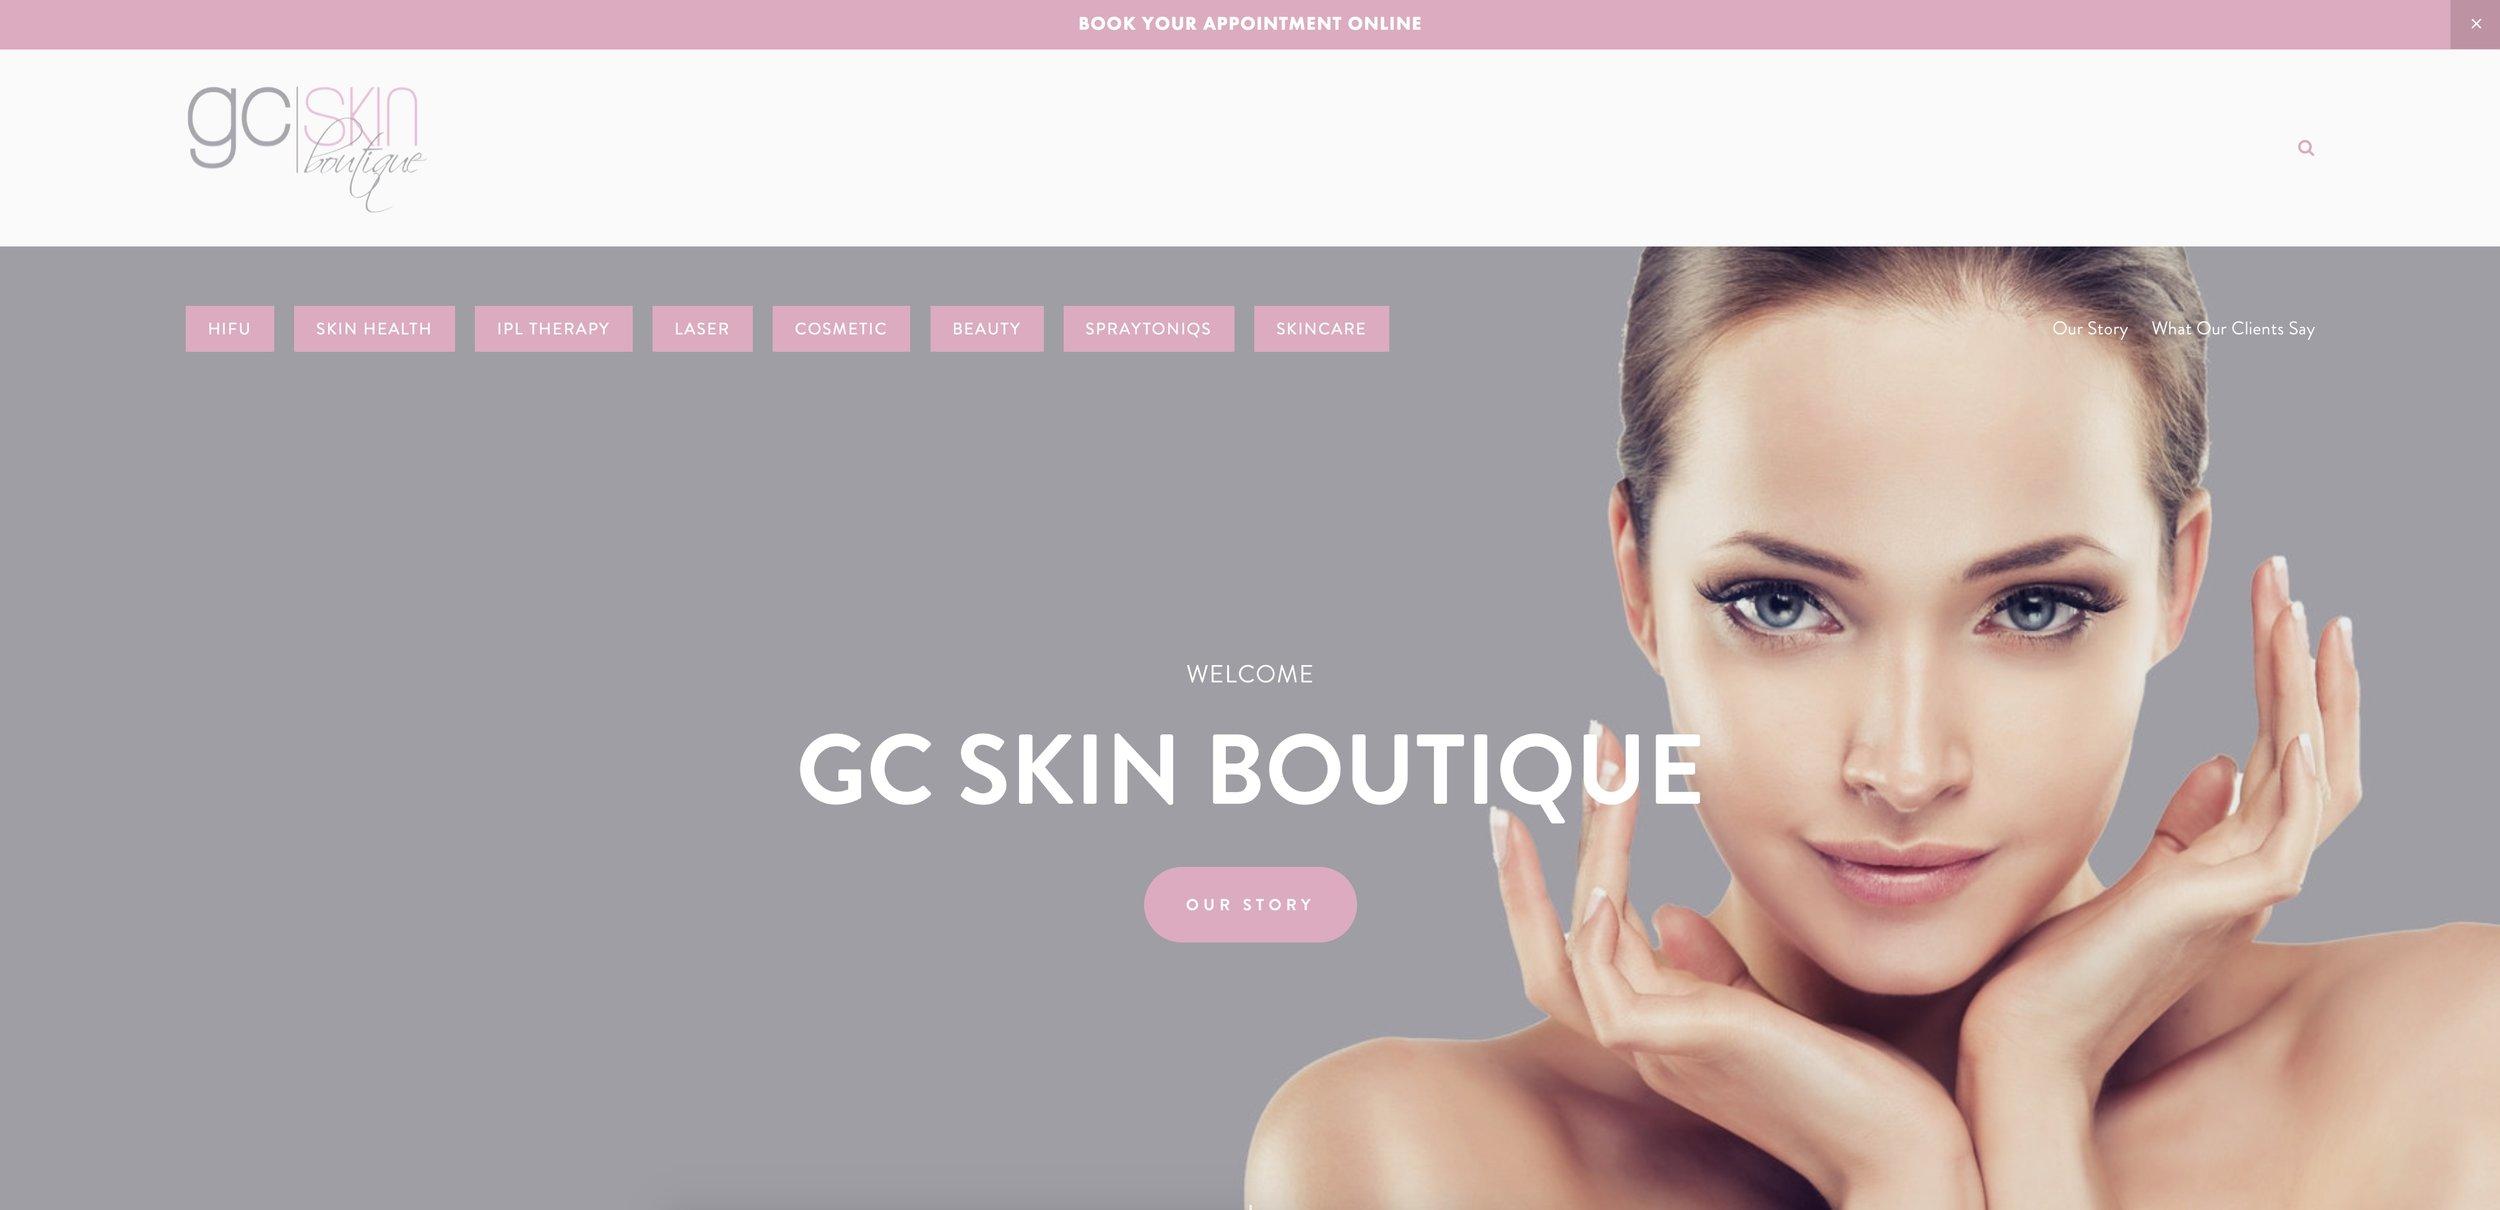 GC+Skin's+Website+1.jpg